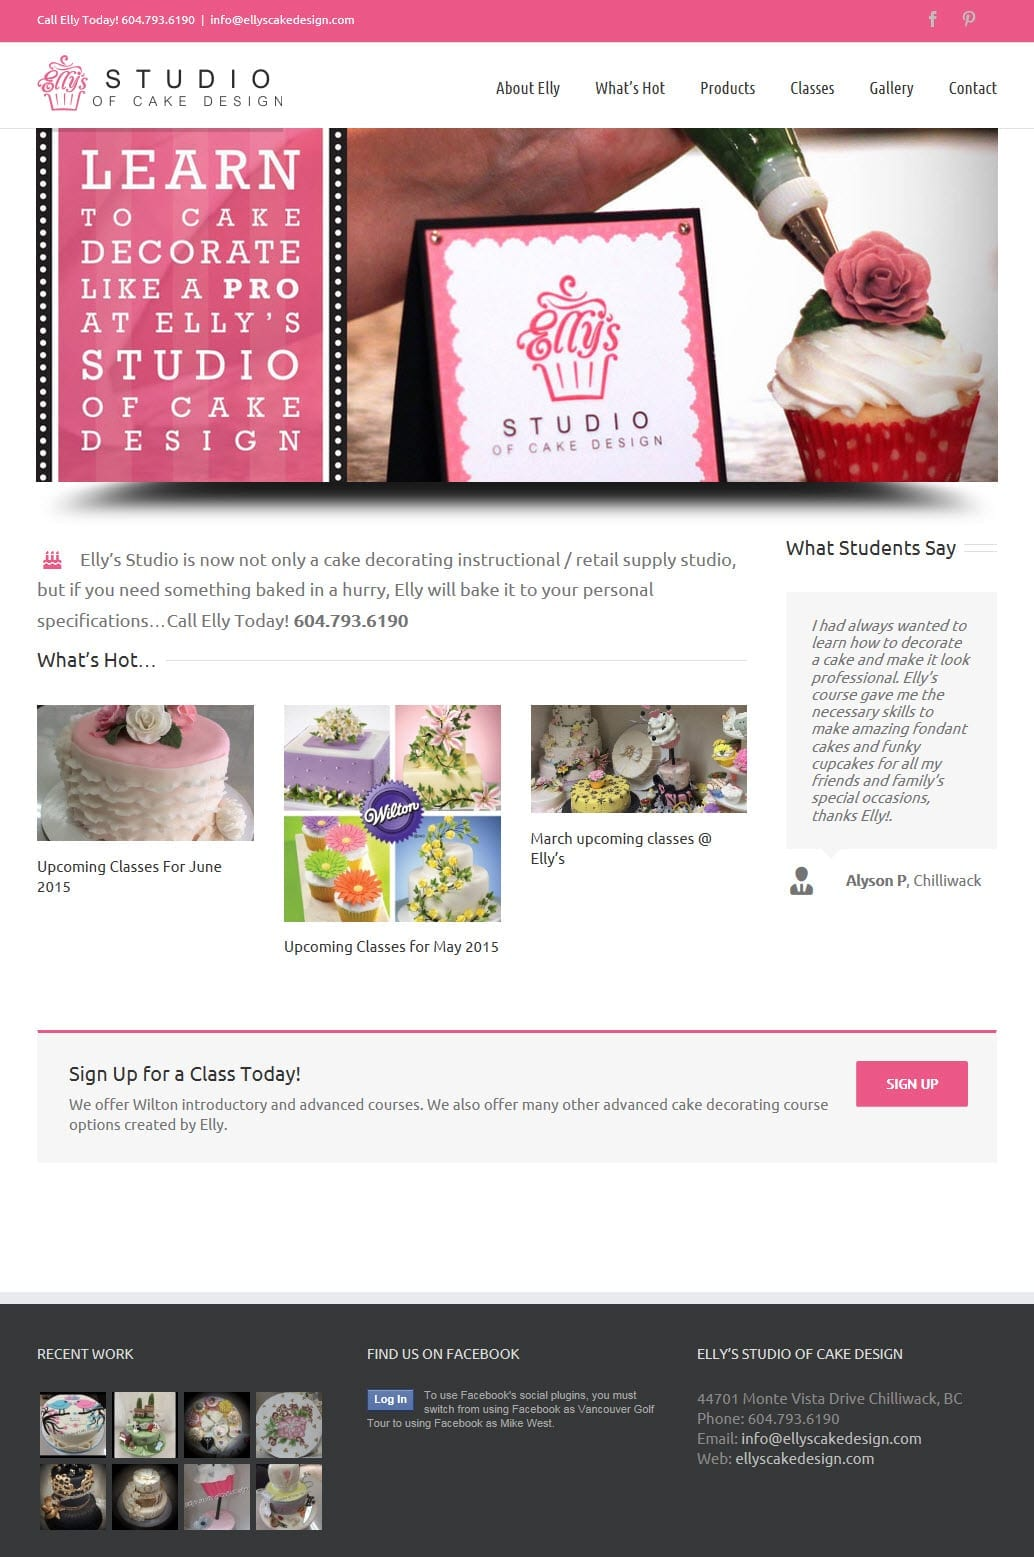 Elly S Studio Cake Design Chilliwack : Elly s Studio of Cake Design   MousePad Publishing Website ...